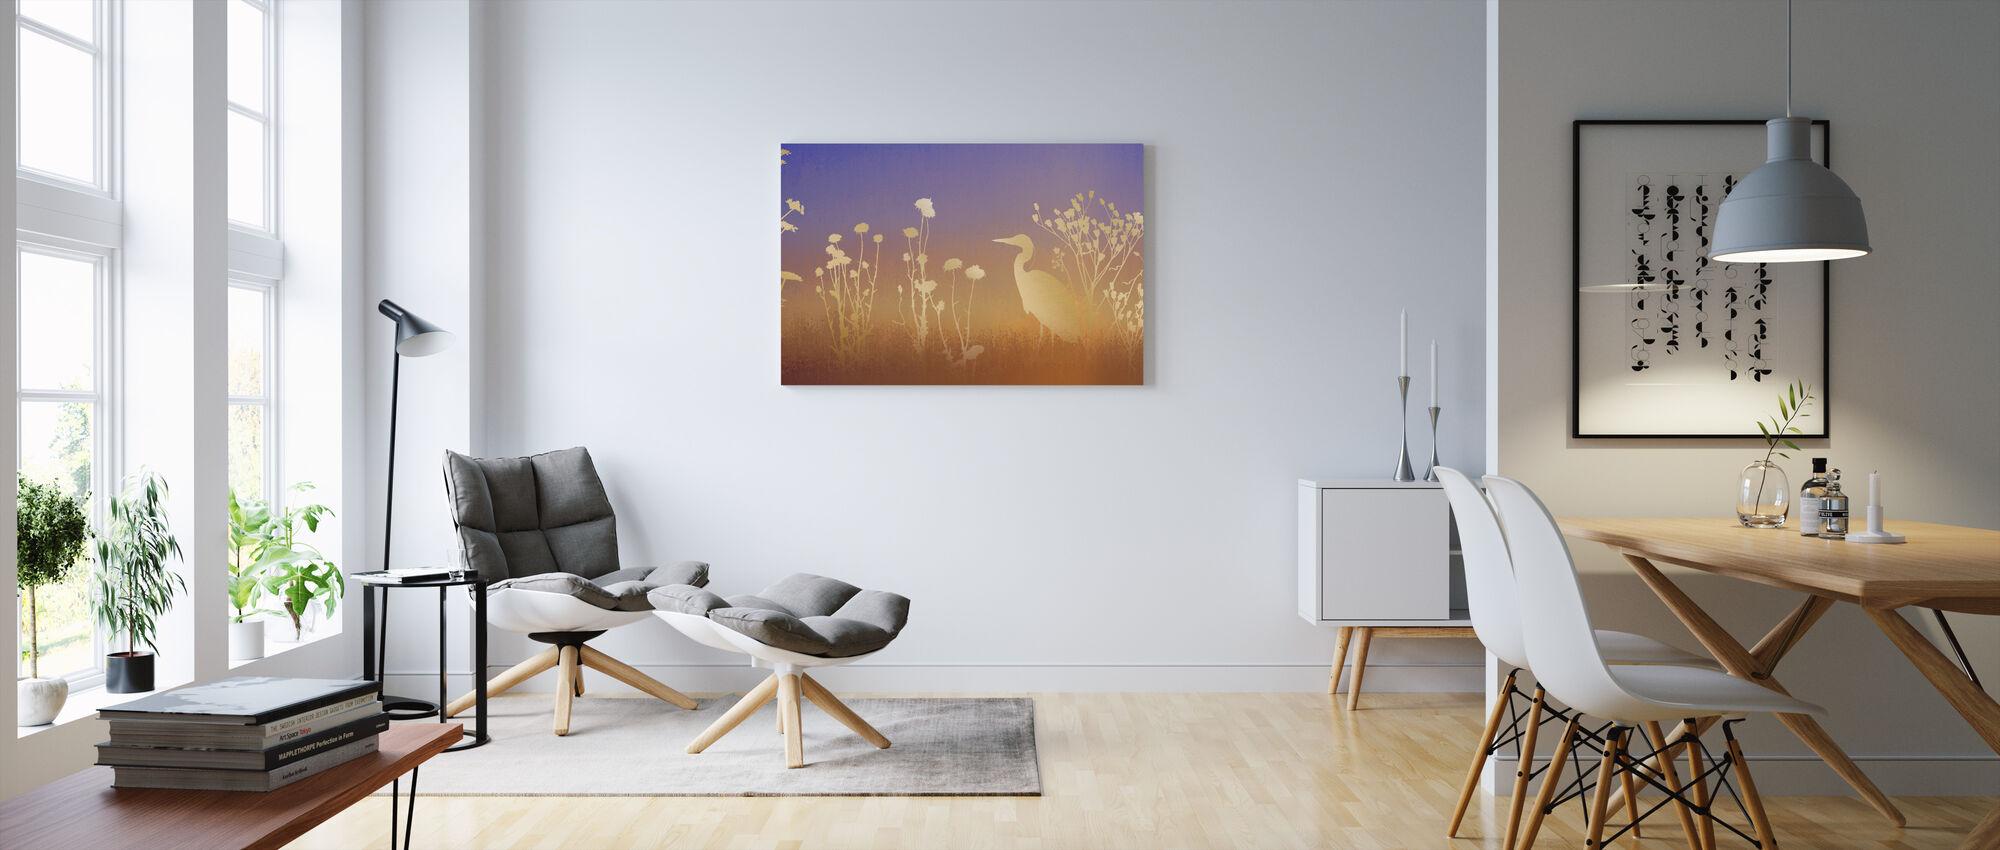 Dawn Silhouettes - Canvas print - Living Room